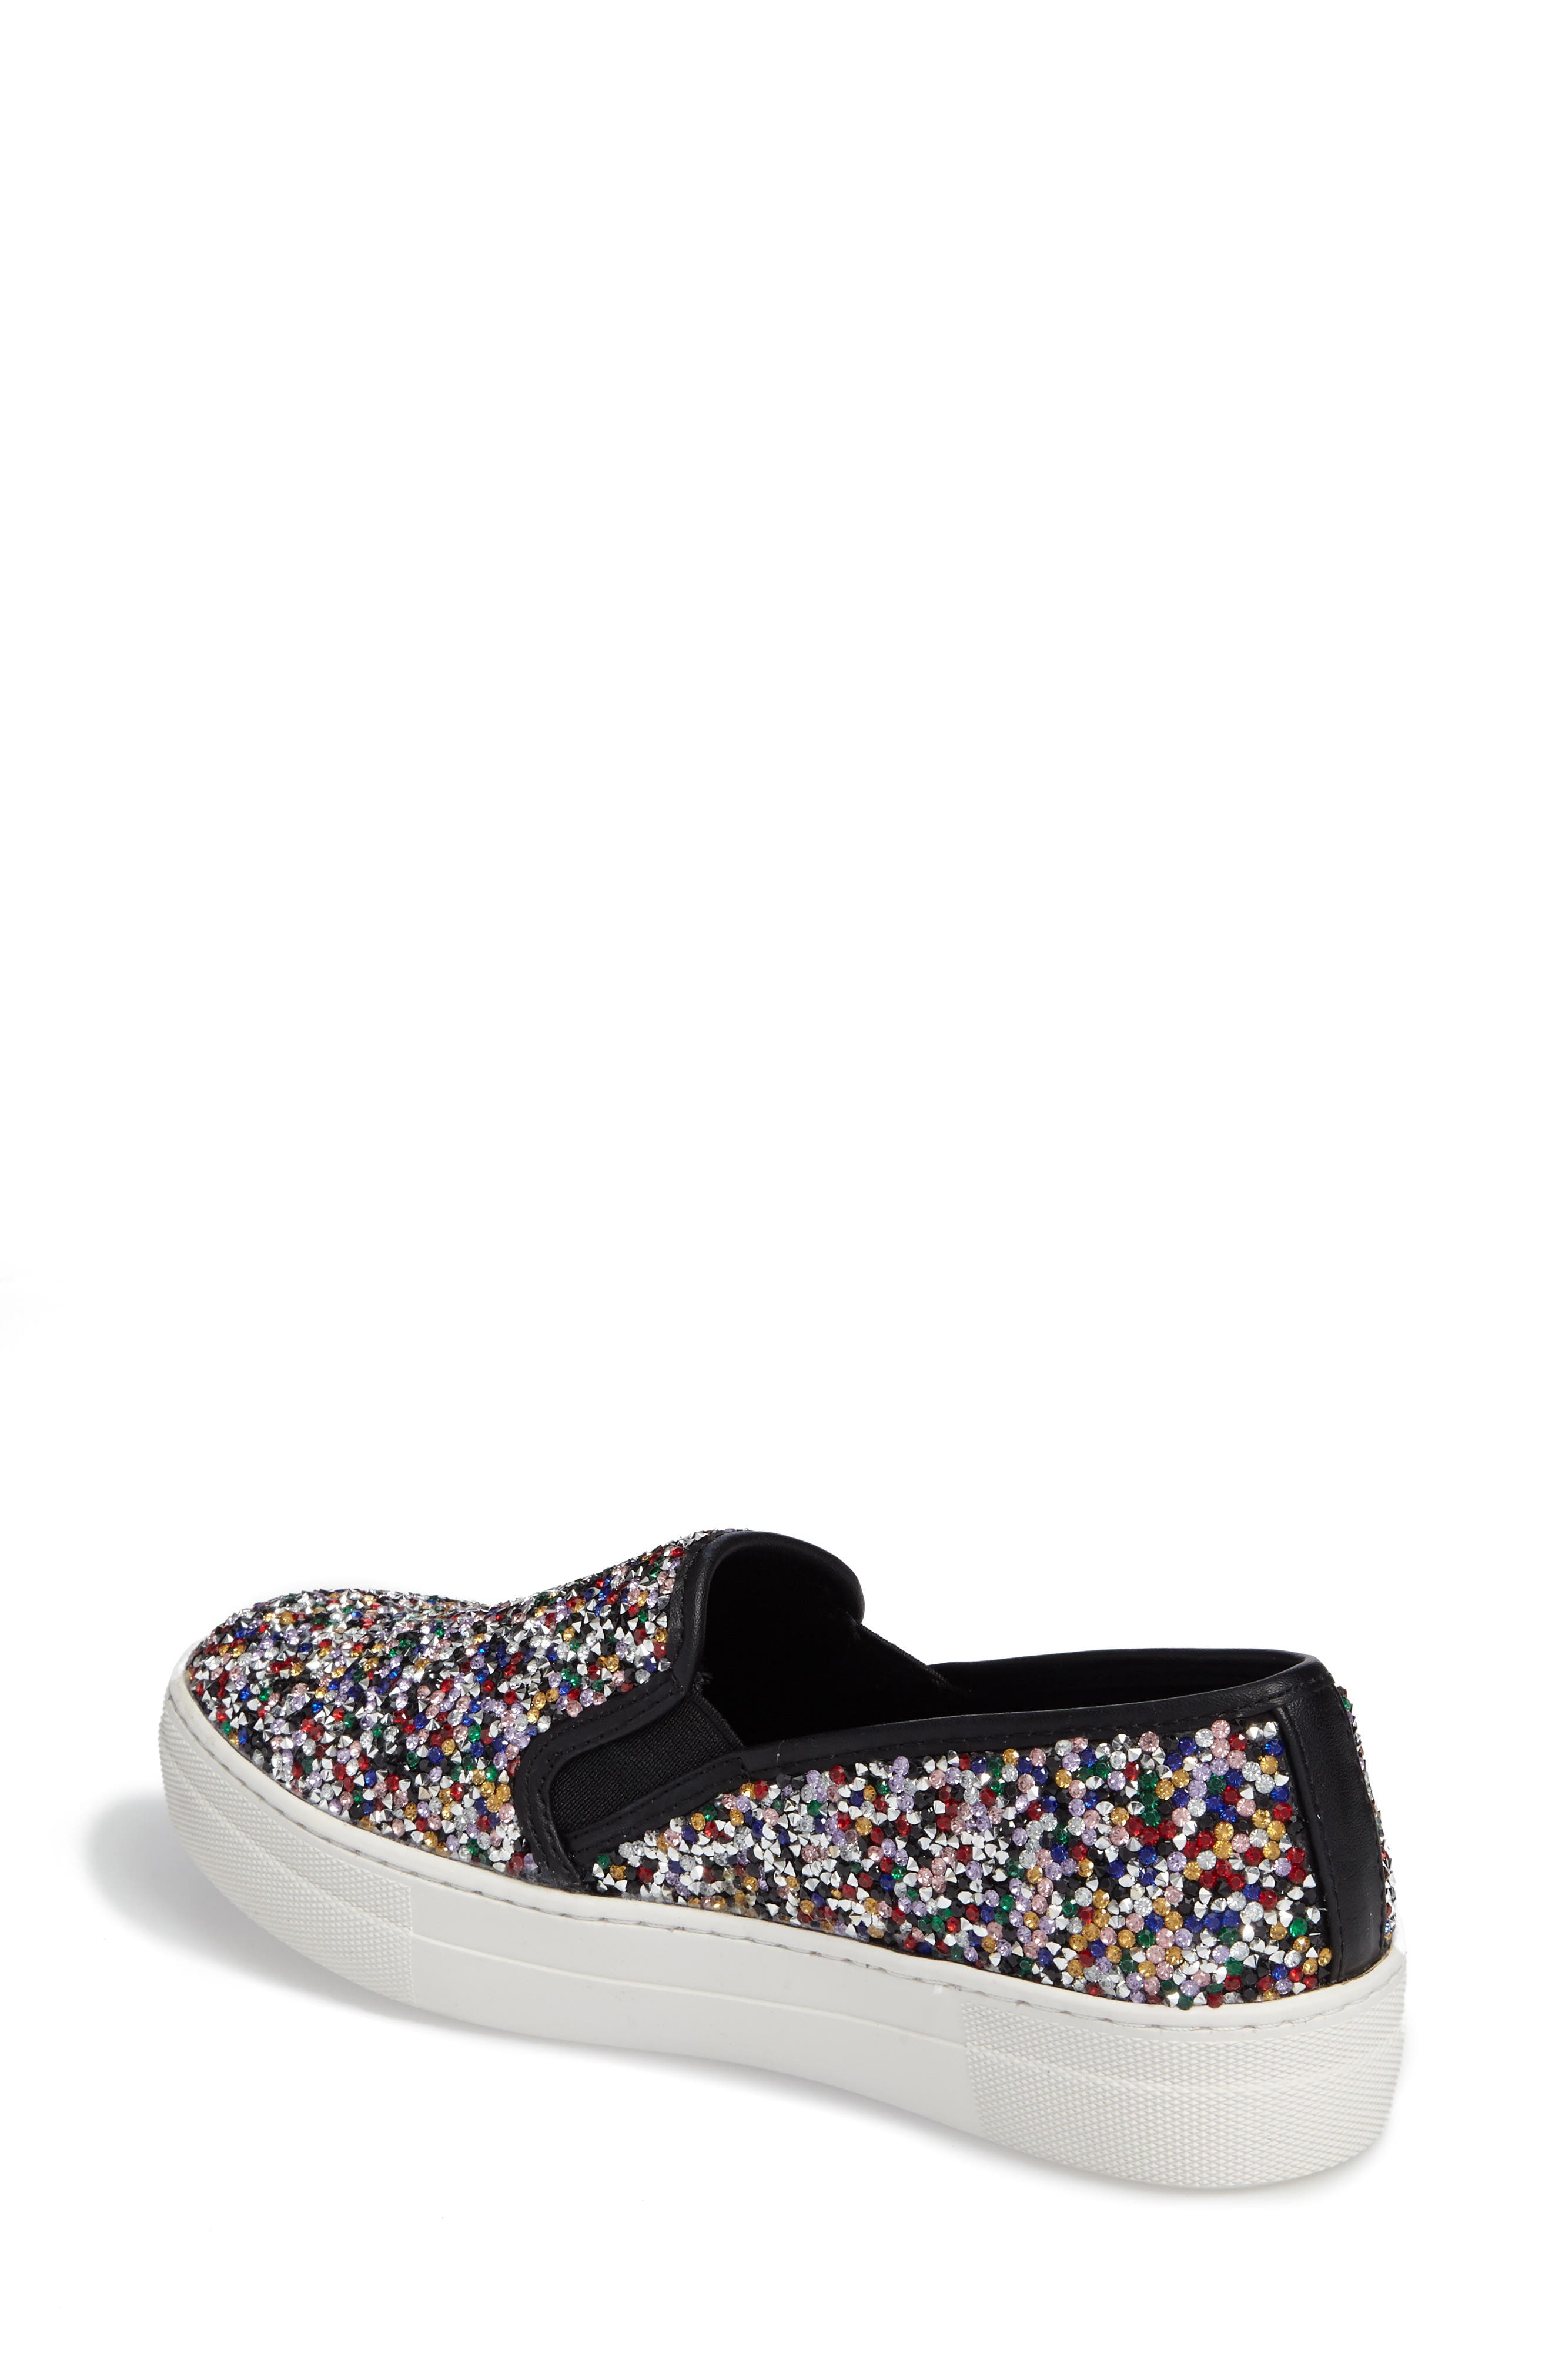 Gracious Slip-On Sneaker,                             Alternate thumbnail 2, color,                             040